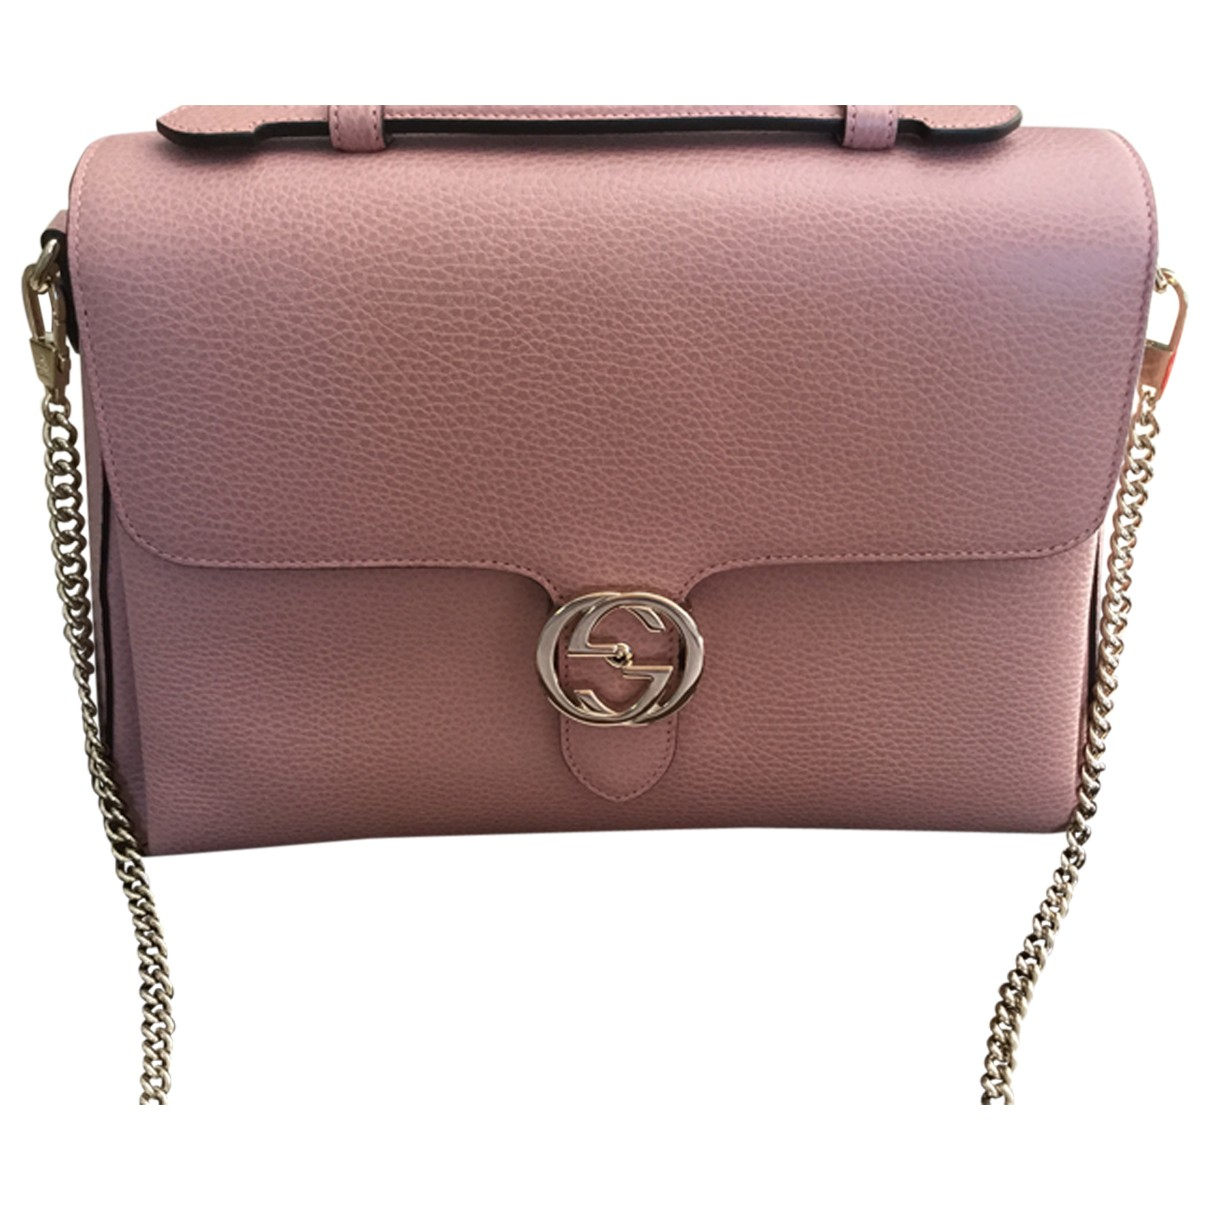 Gucci Interlocking Pink Leather handbag for Women N